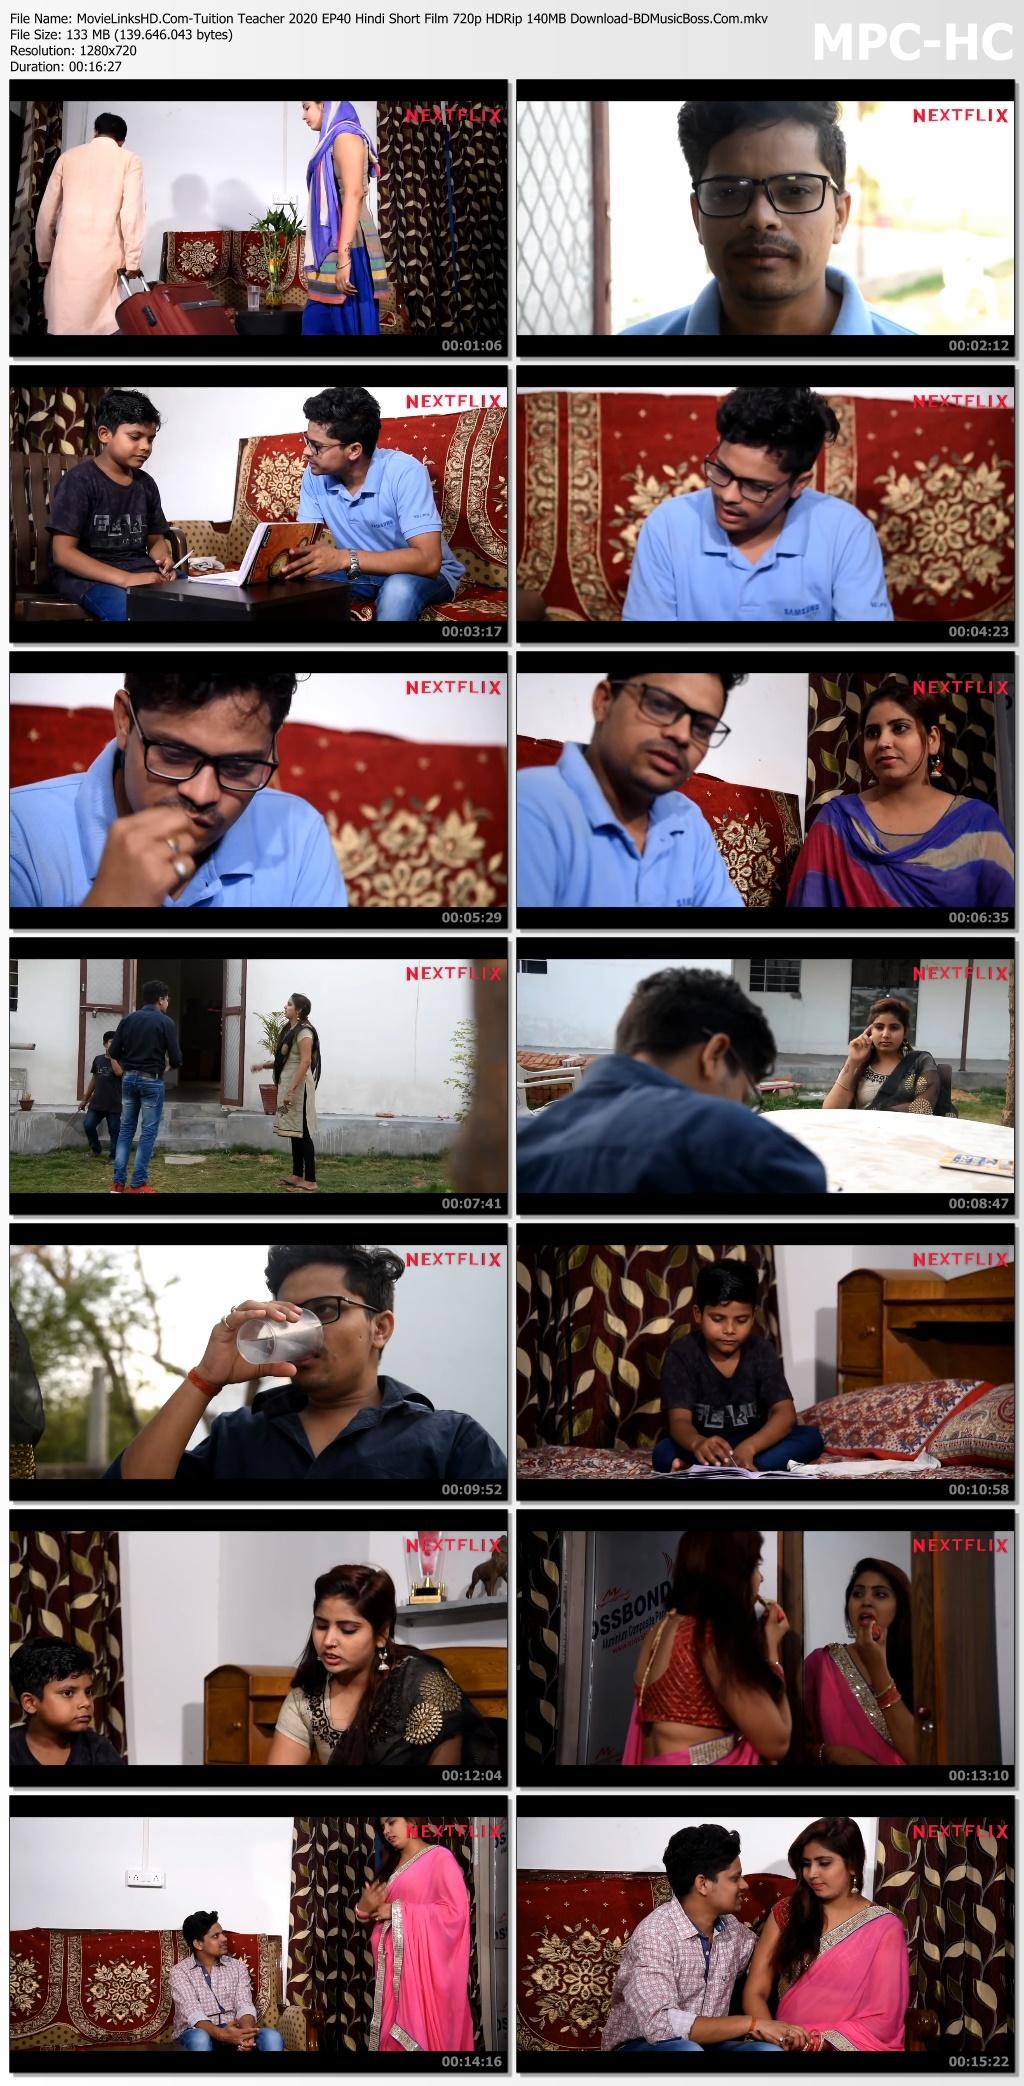 Movie-Links-HD-Com-Tuition-Teacher-2020-EP40-Hindi-Short-Film-720p-HDRip-140-MB-Download-BDMusic-Bos